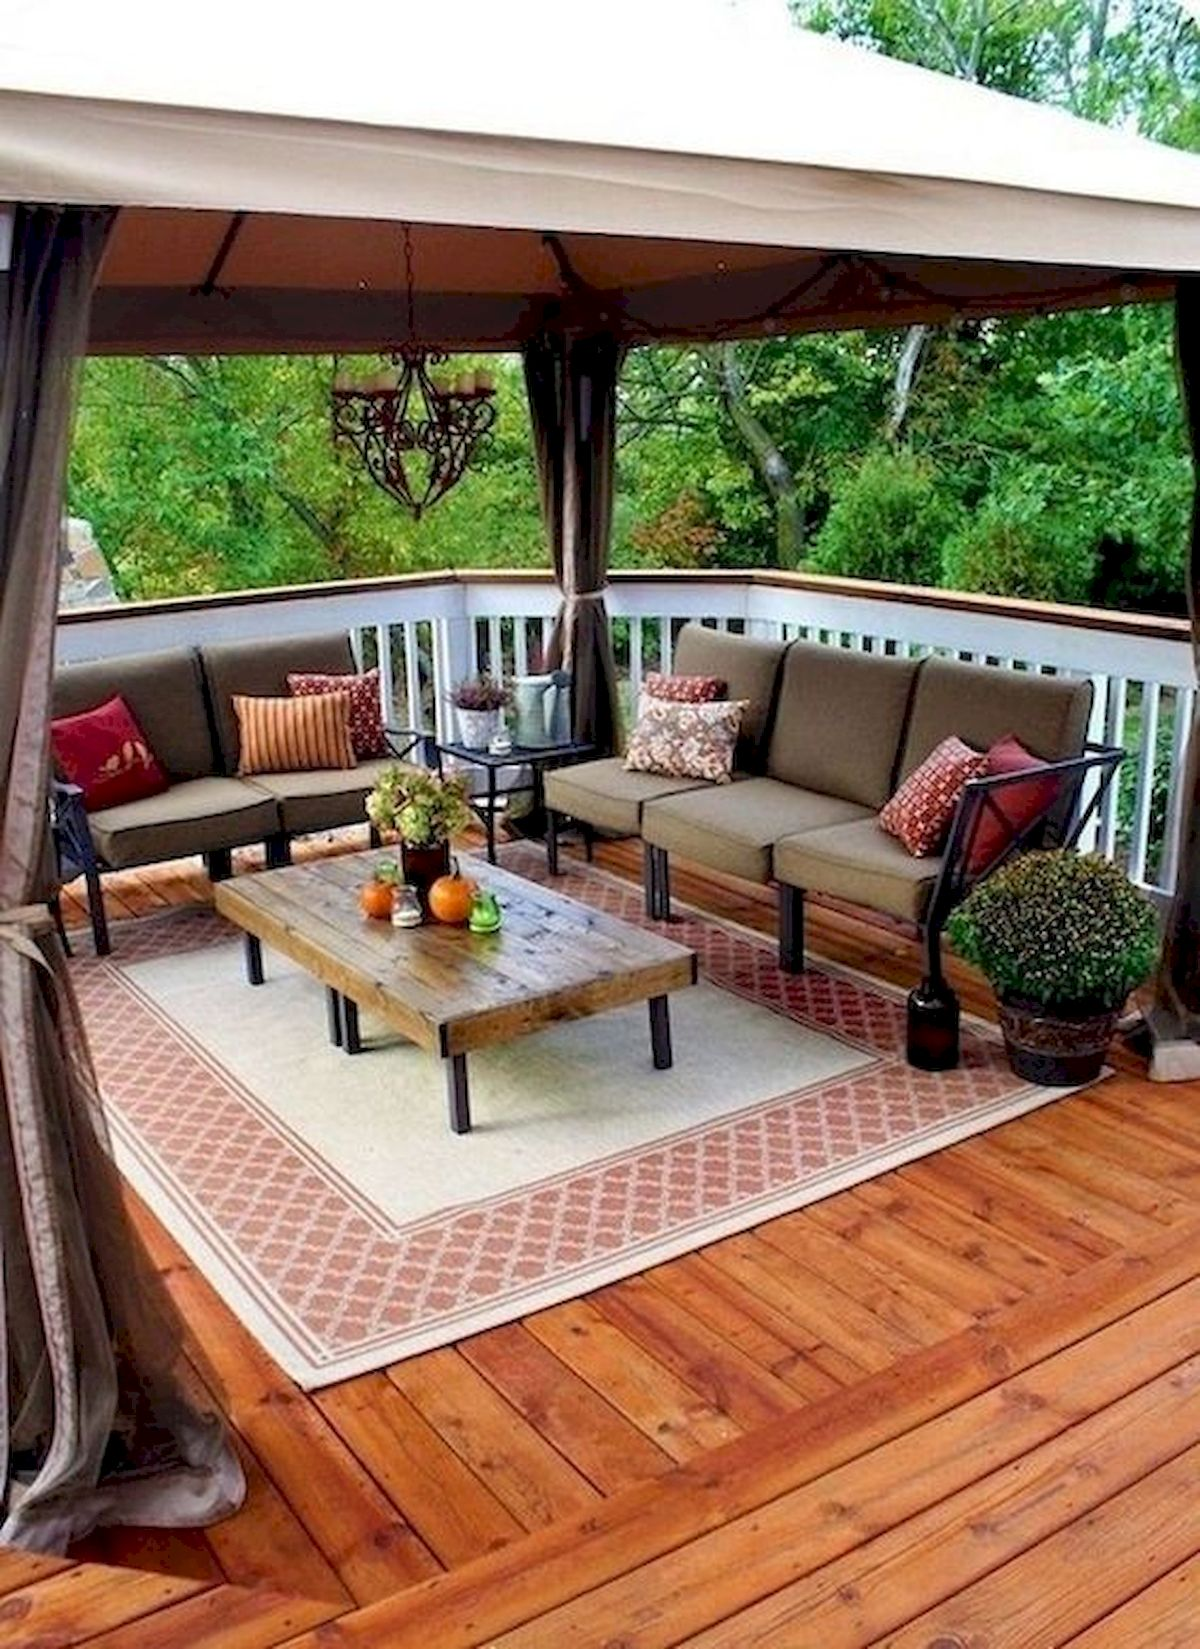 50 Fantastic Backyard Patio And Decking Design Ideas (3)